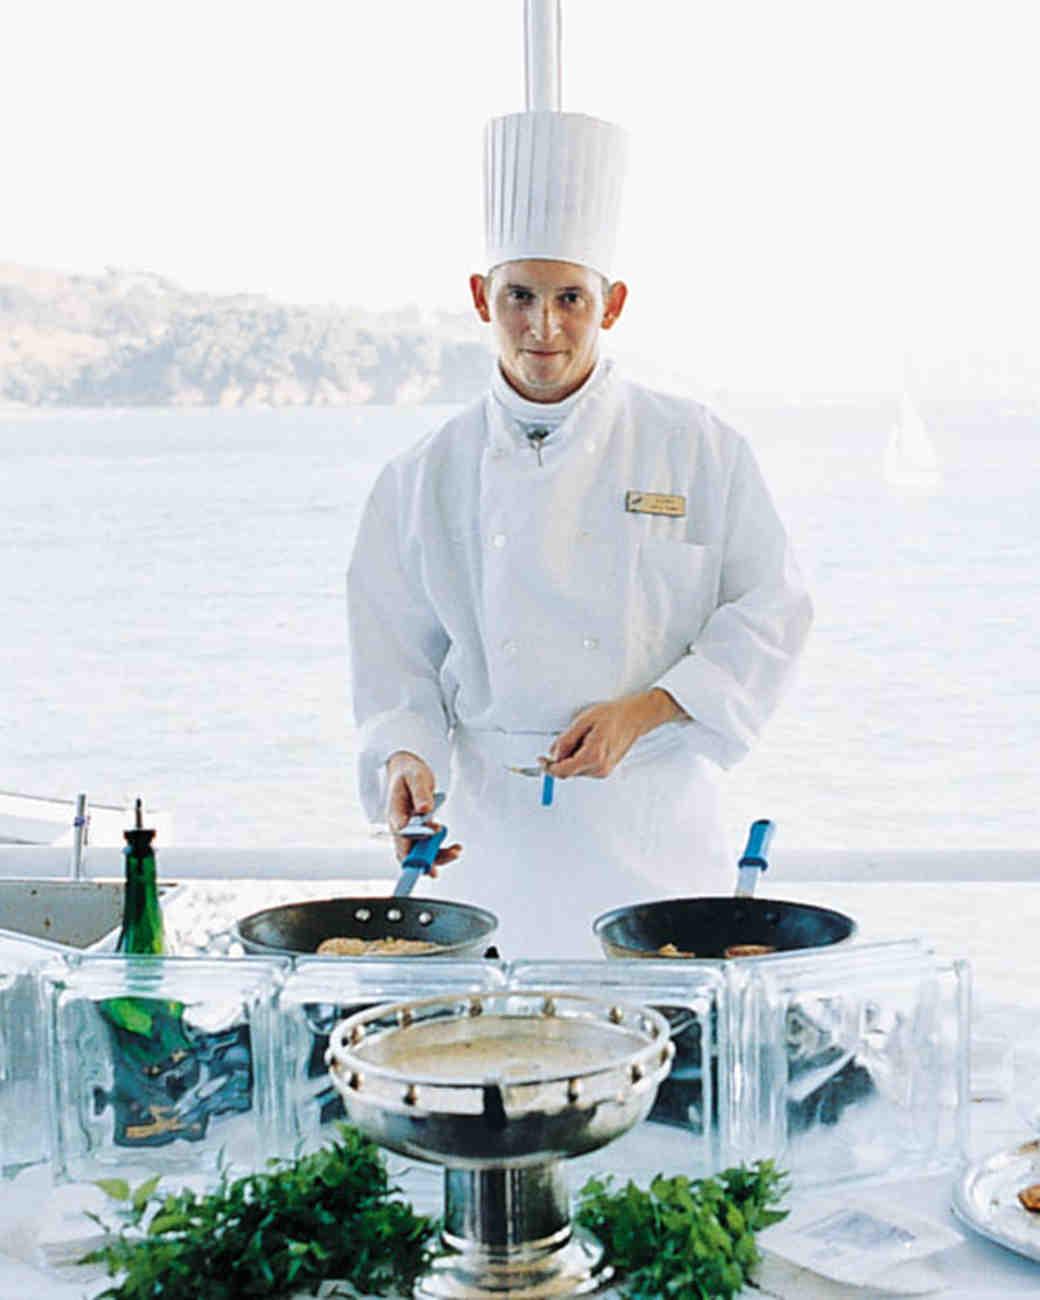 Wedding Chef Preparing Food